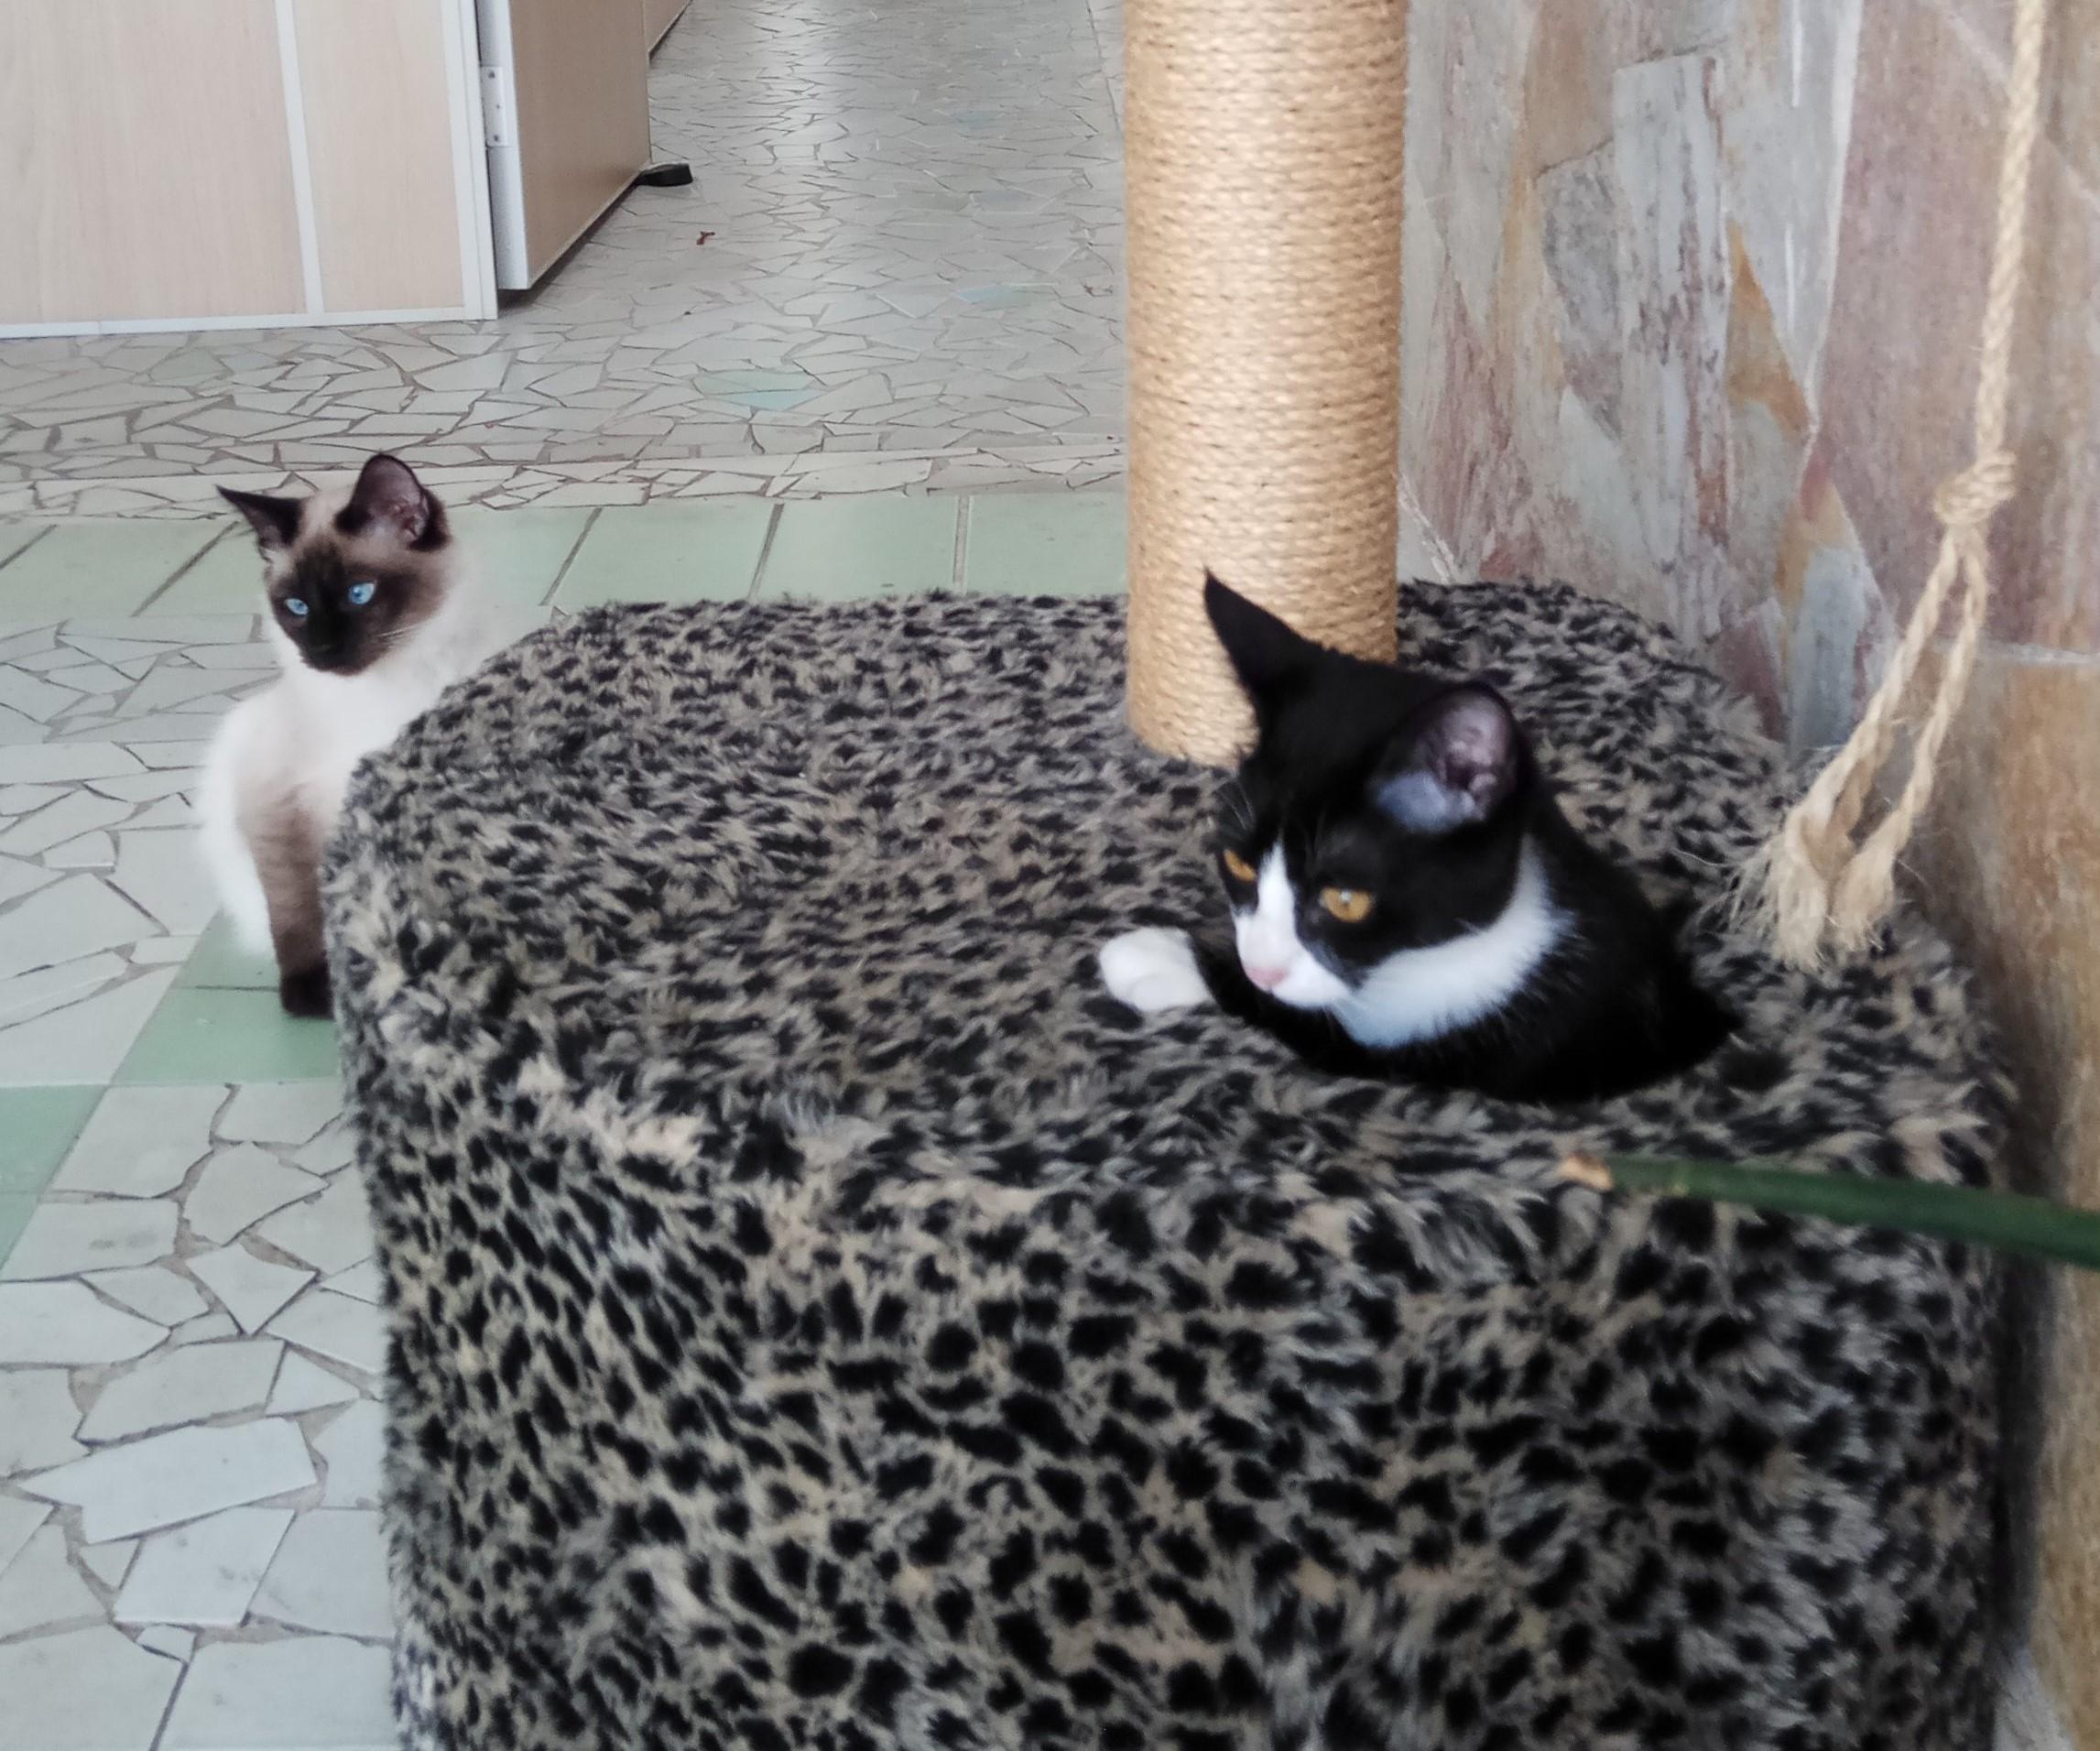 hotel para gato na zona leste, hotel para gato no tatuapé, hotel para gatos na zona leste, hotel para gatos no tatuapé, hotel para felinos na zona leste, hotel para felinos no tatuapé, hotel para gatos, hotel para felinos, hotel para felinos